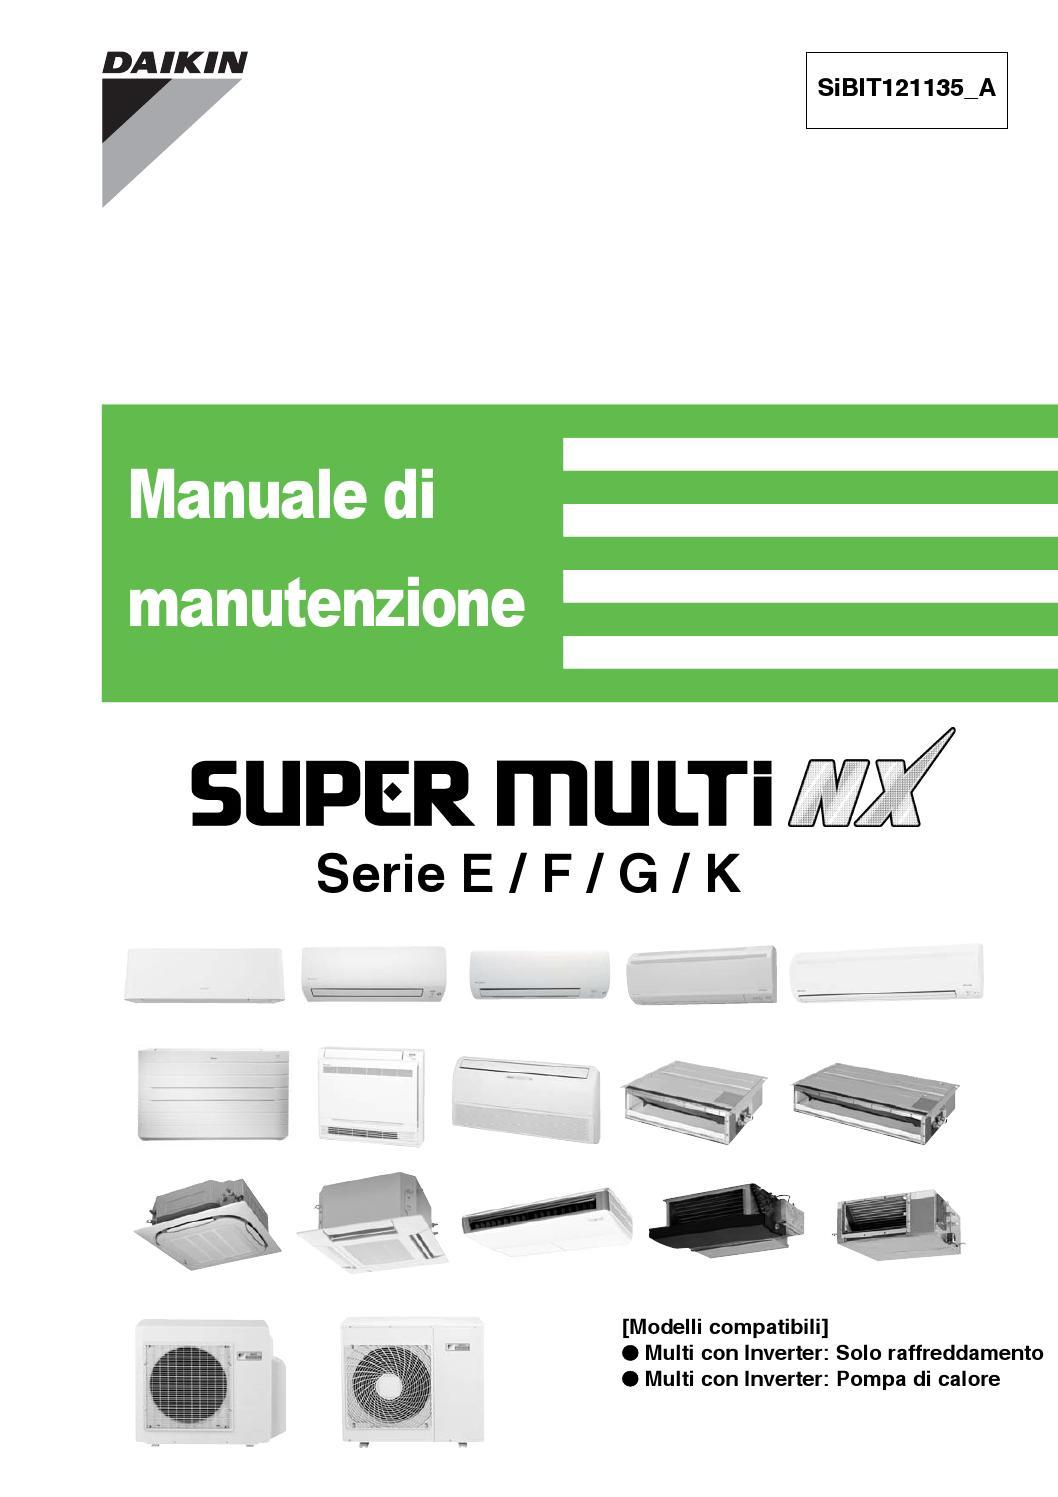 Schema Elettrico Daikin : Daikin italian service manual by paulo moreno issuu